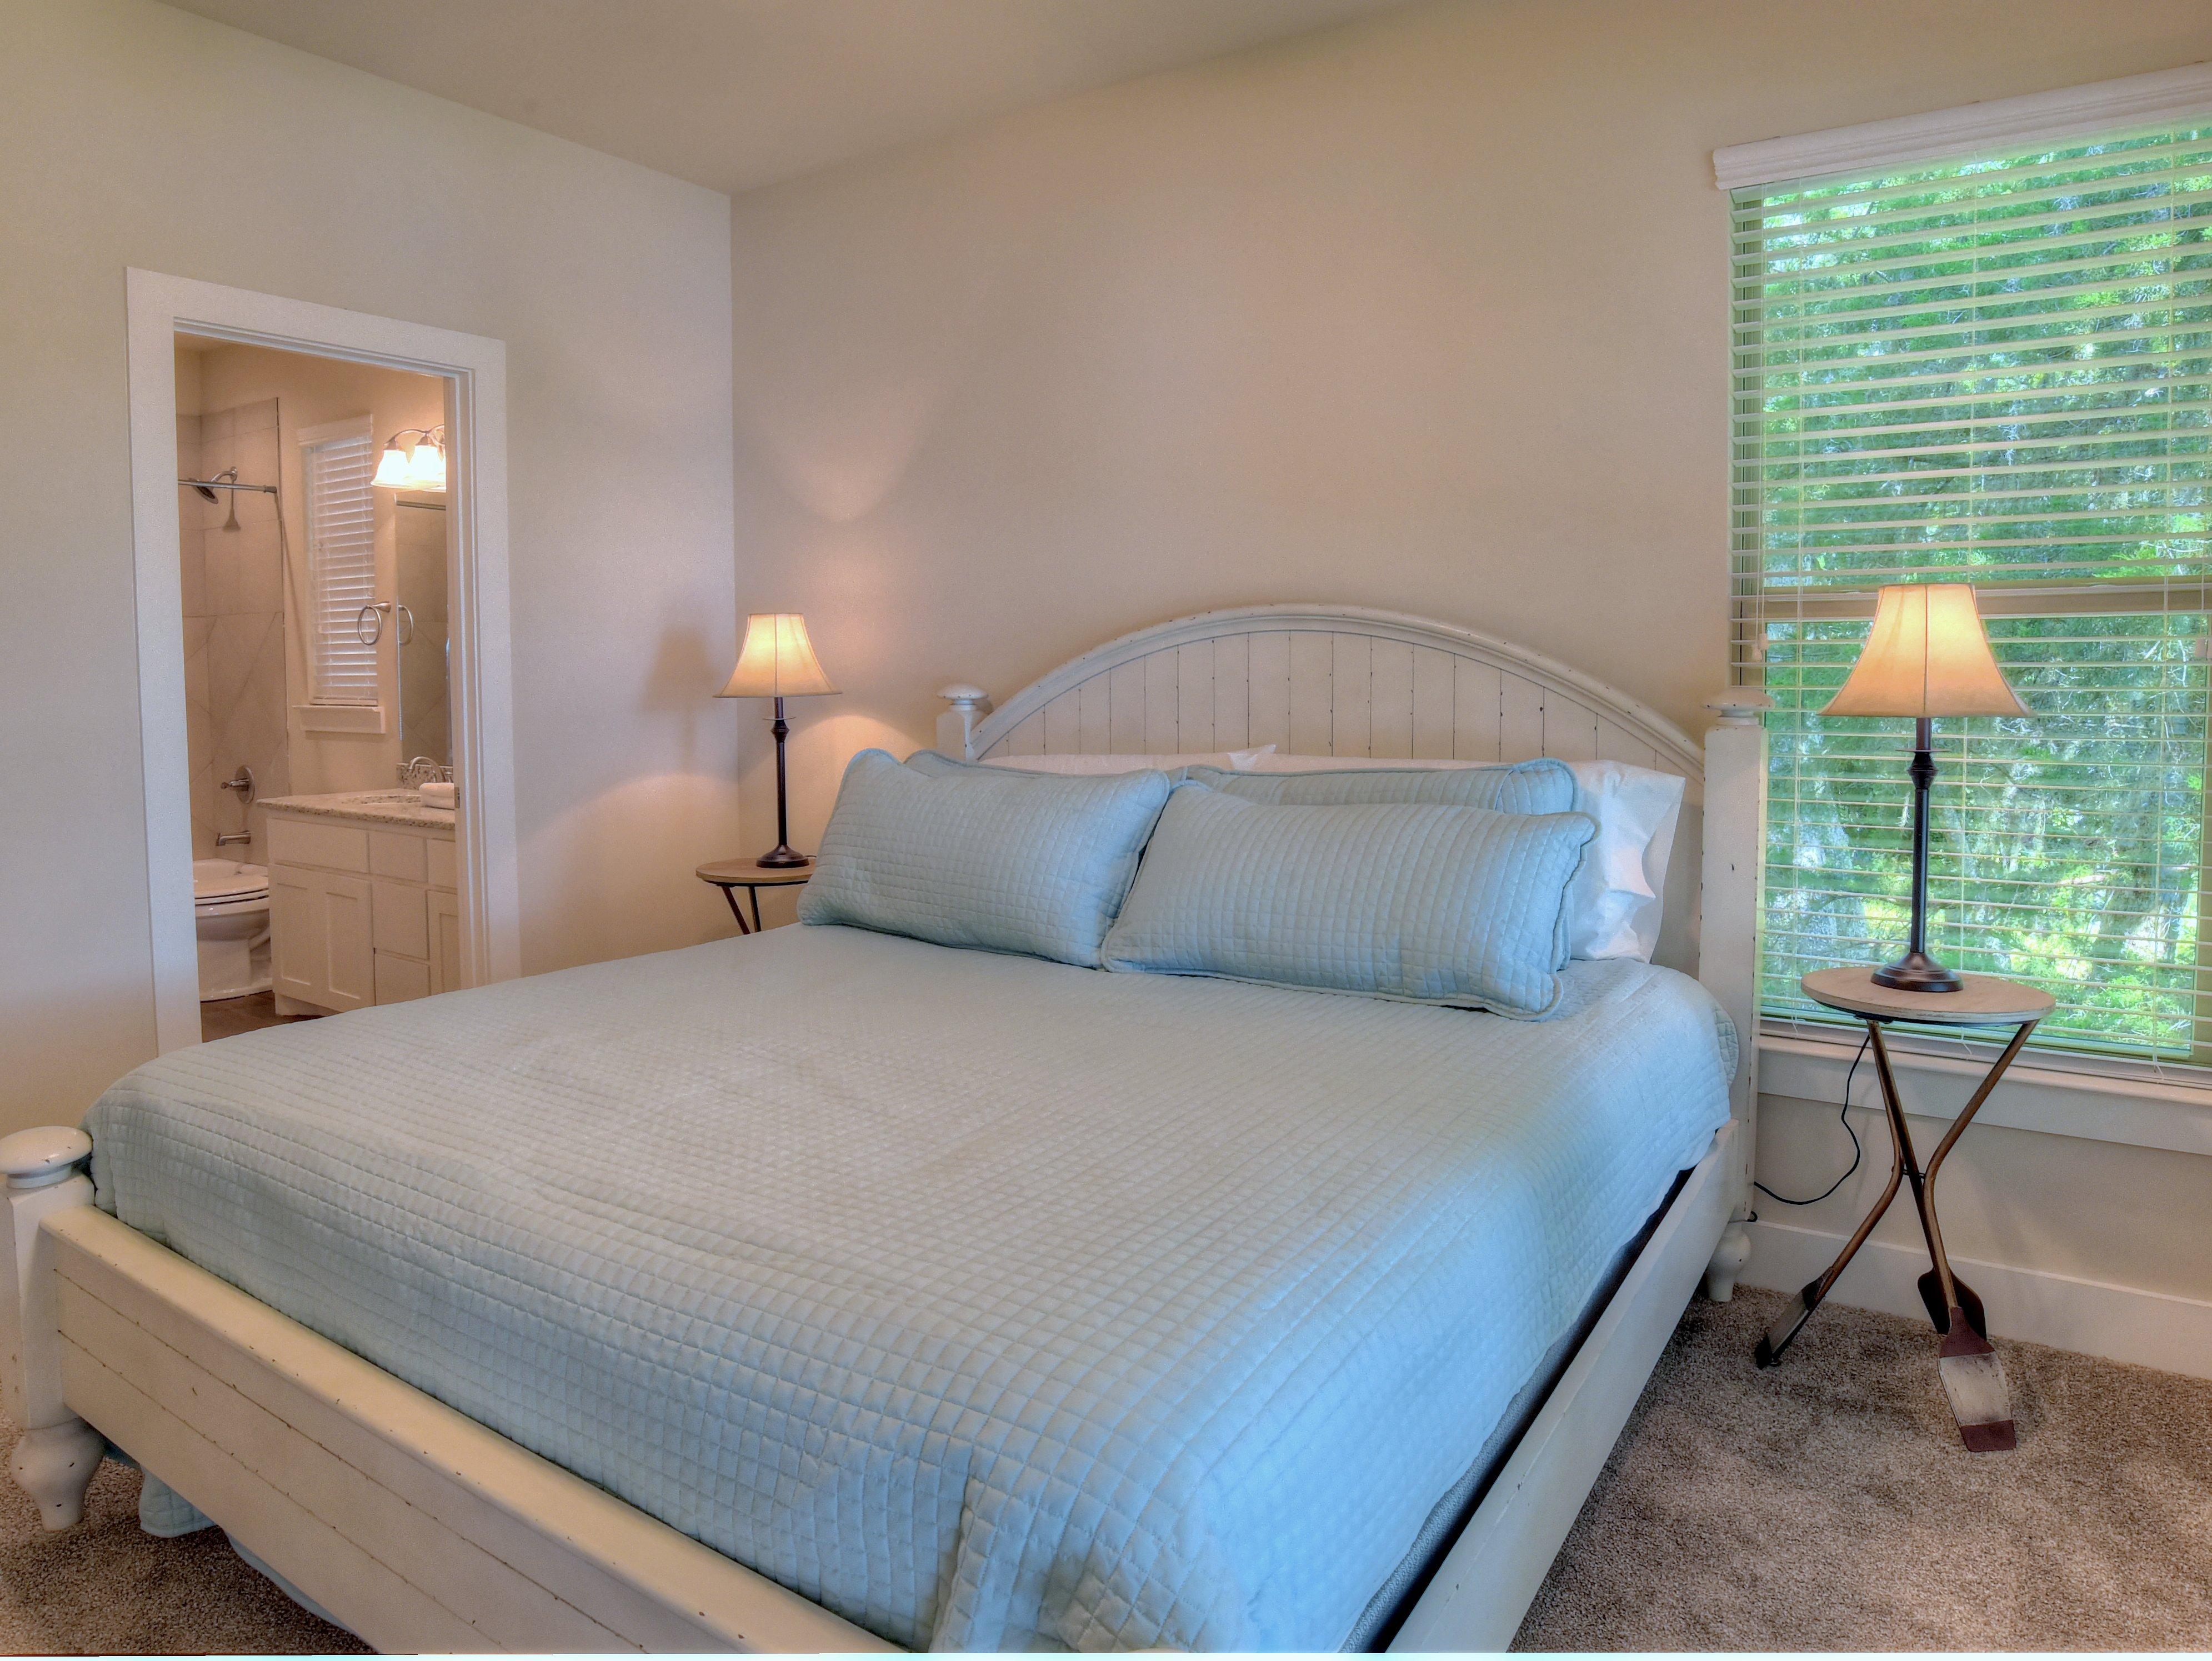 93 Beacon Point Condo rental in Sandestin Rentals ~ Cottages and Villas  in Destin Florida - #23